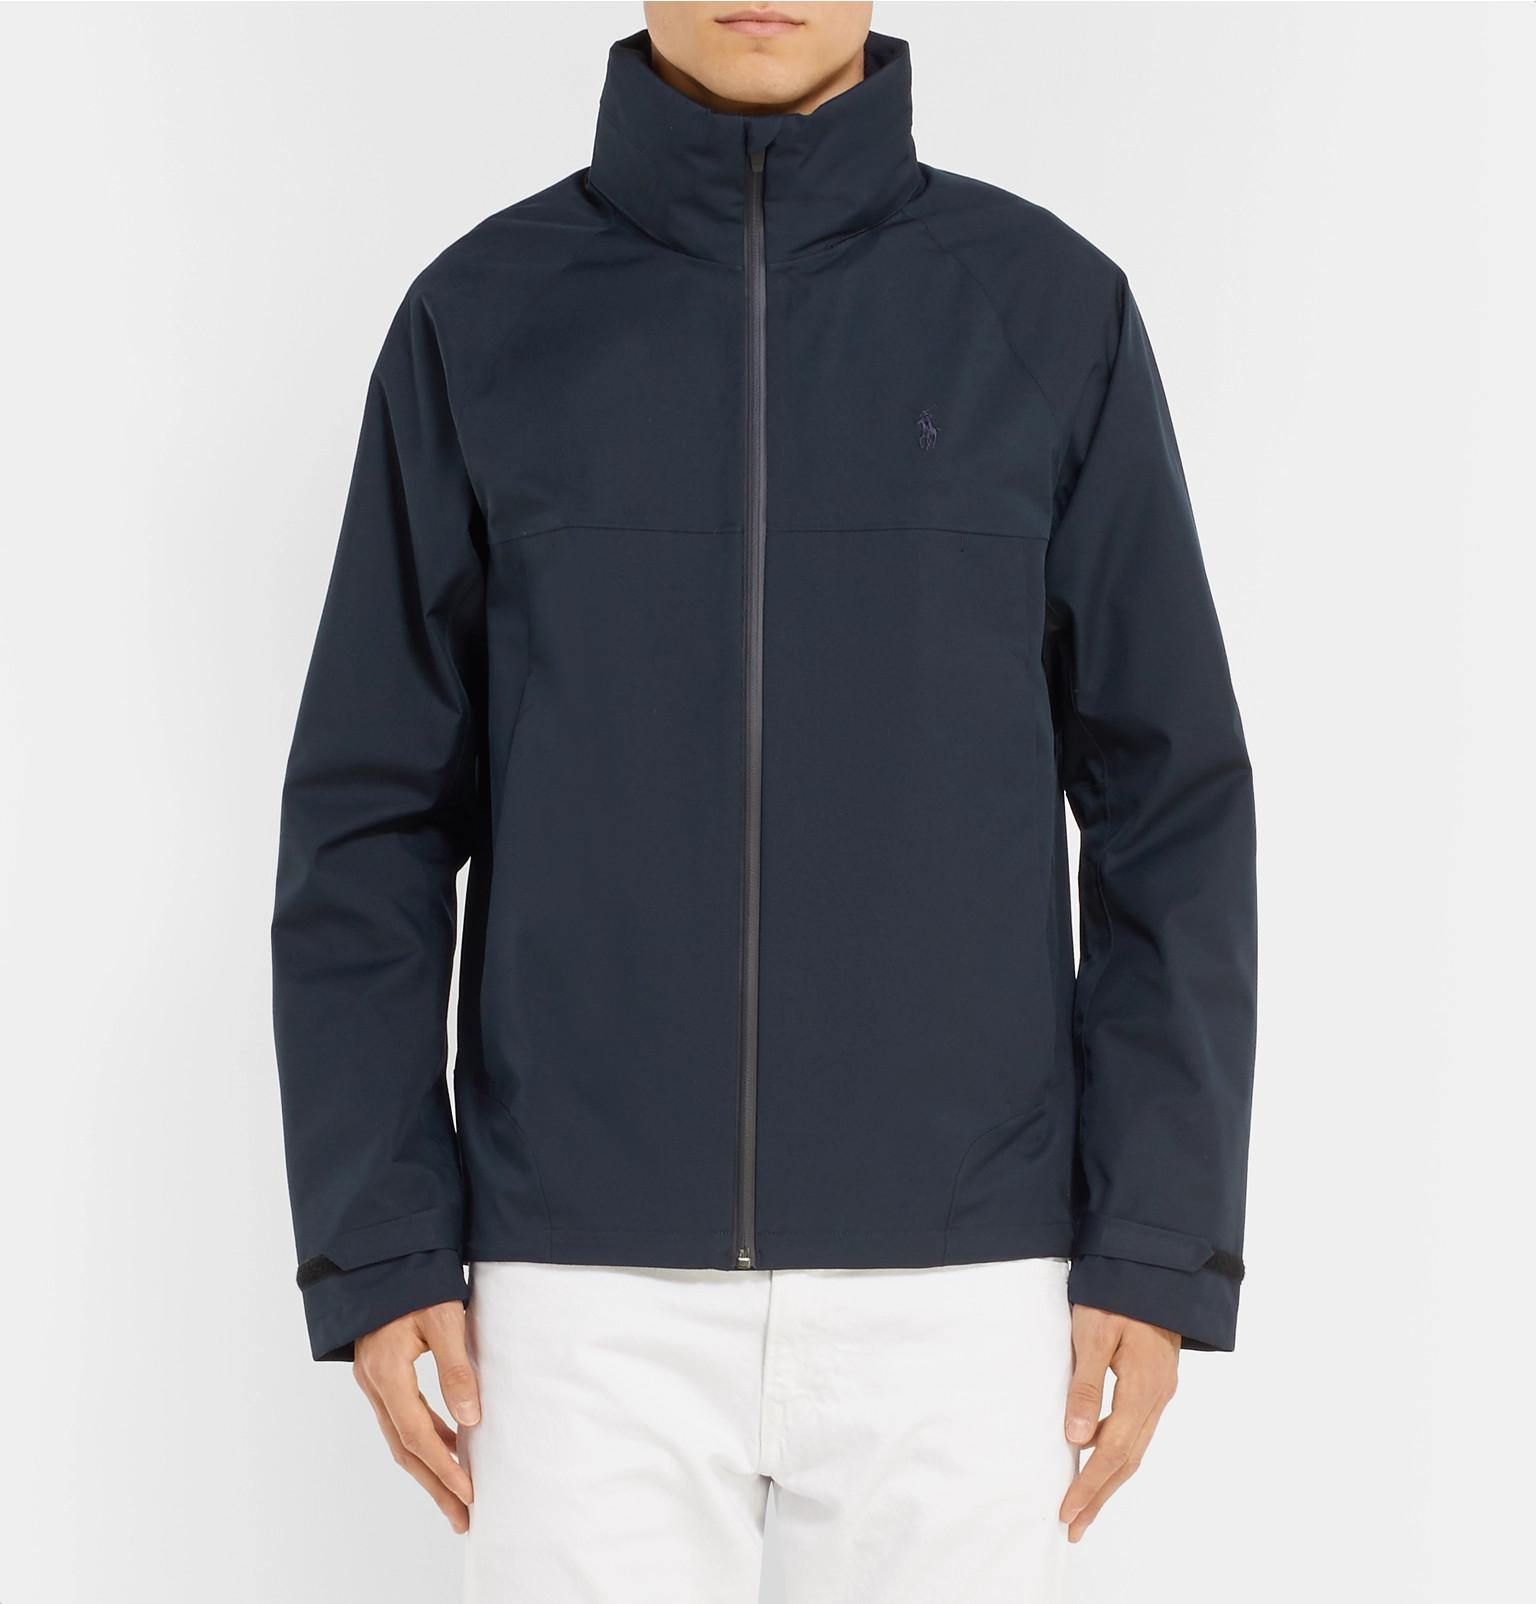 cefb9b0f1270 Lyst - Polo Ralph Lauren Shell Hooded Jacket in Blue for Men